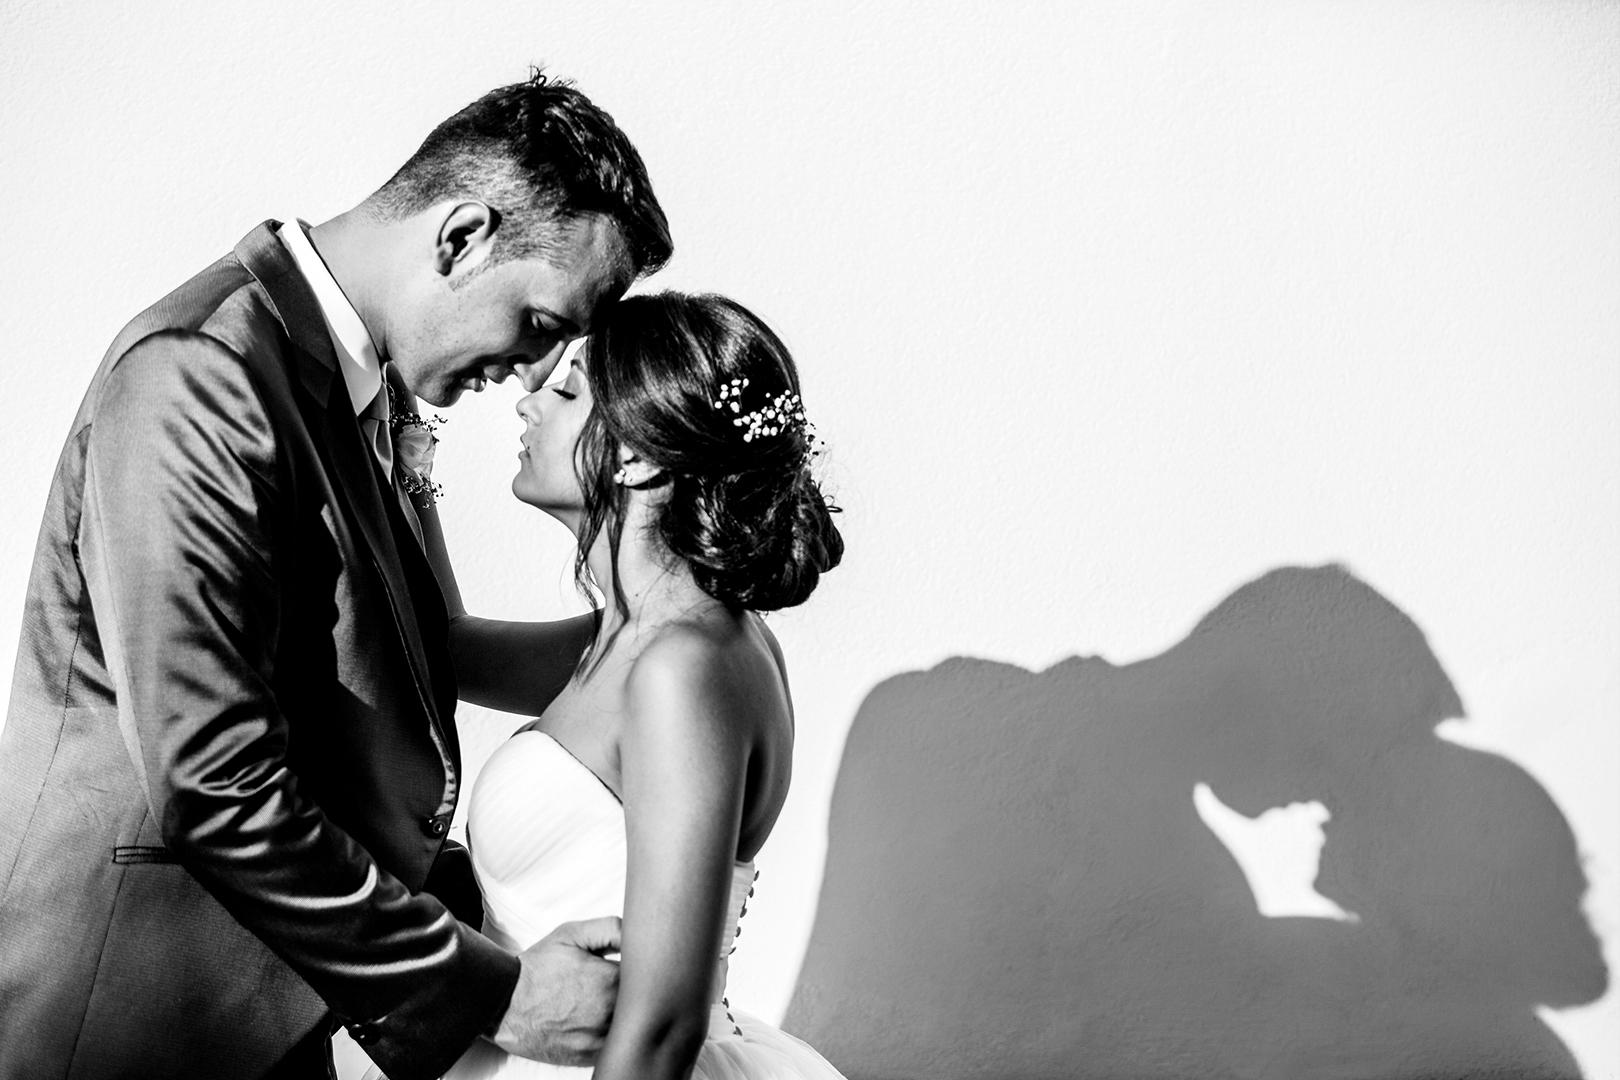 60 gianni-lepore-ombre-sposi